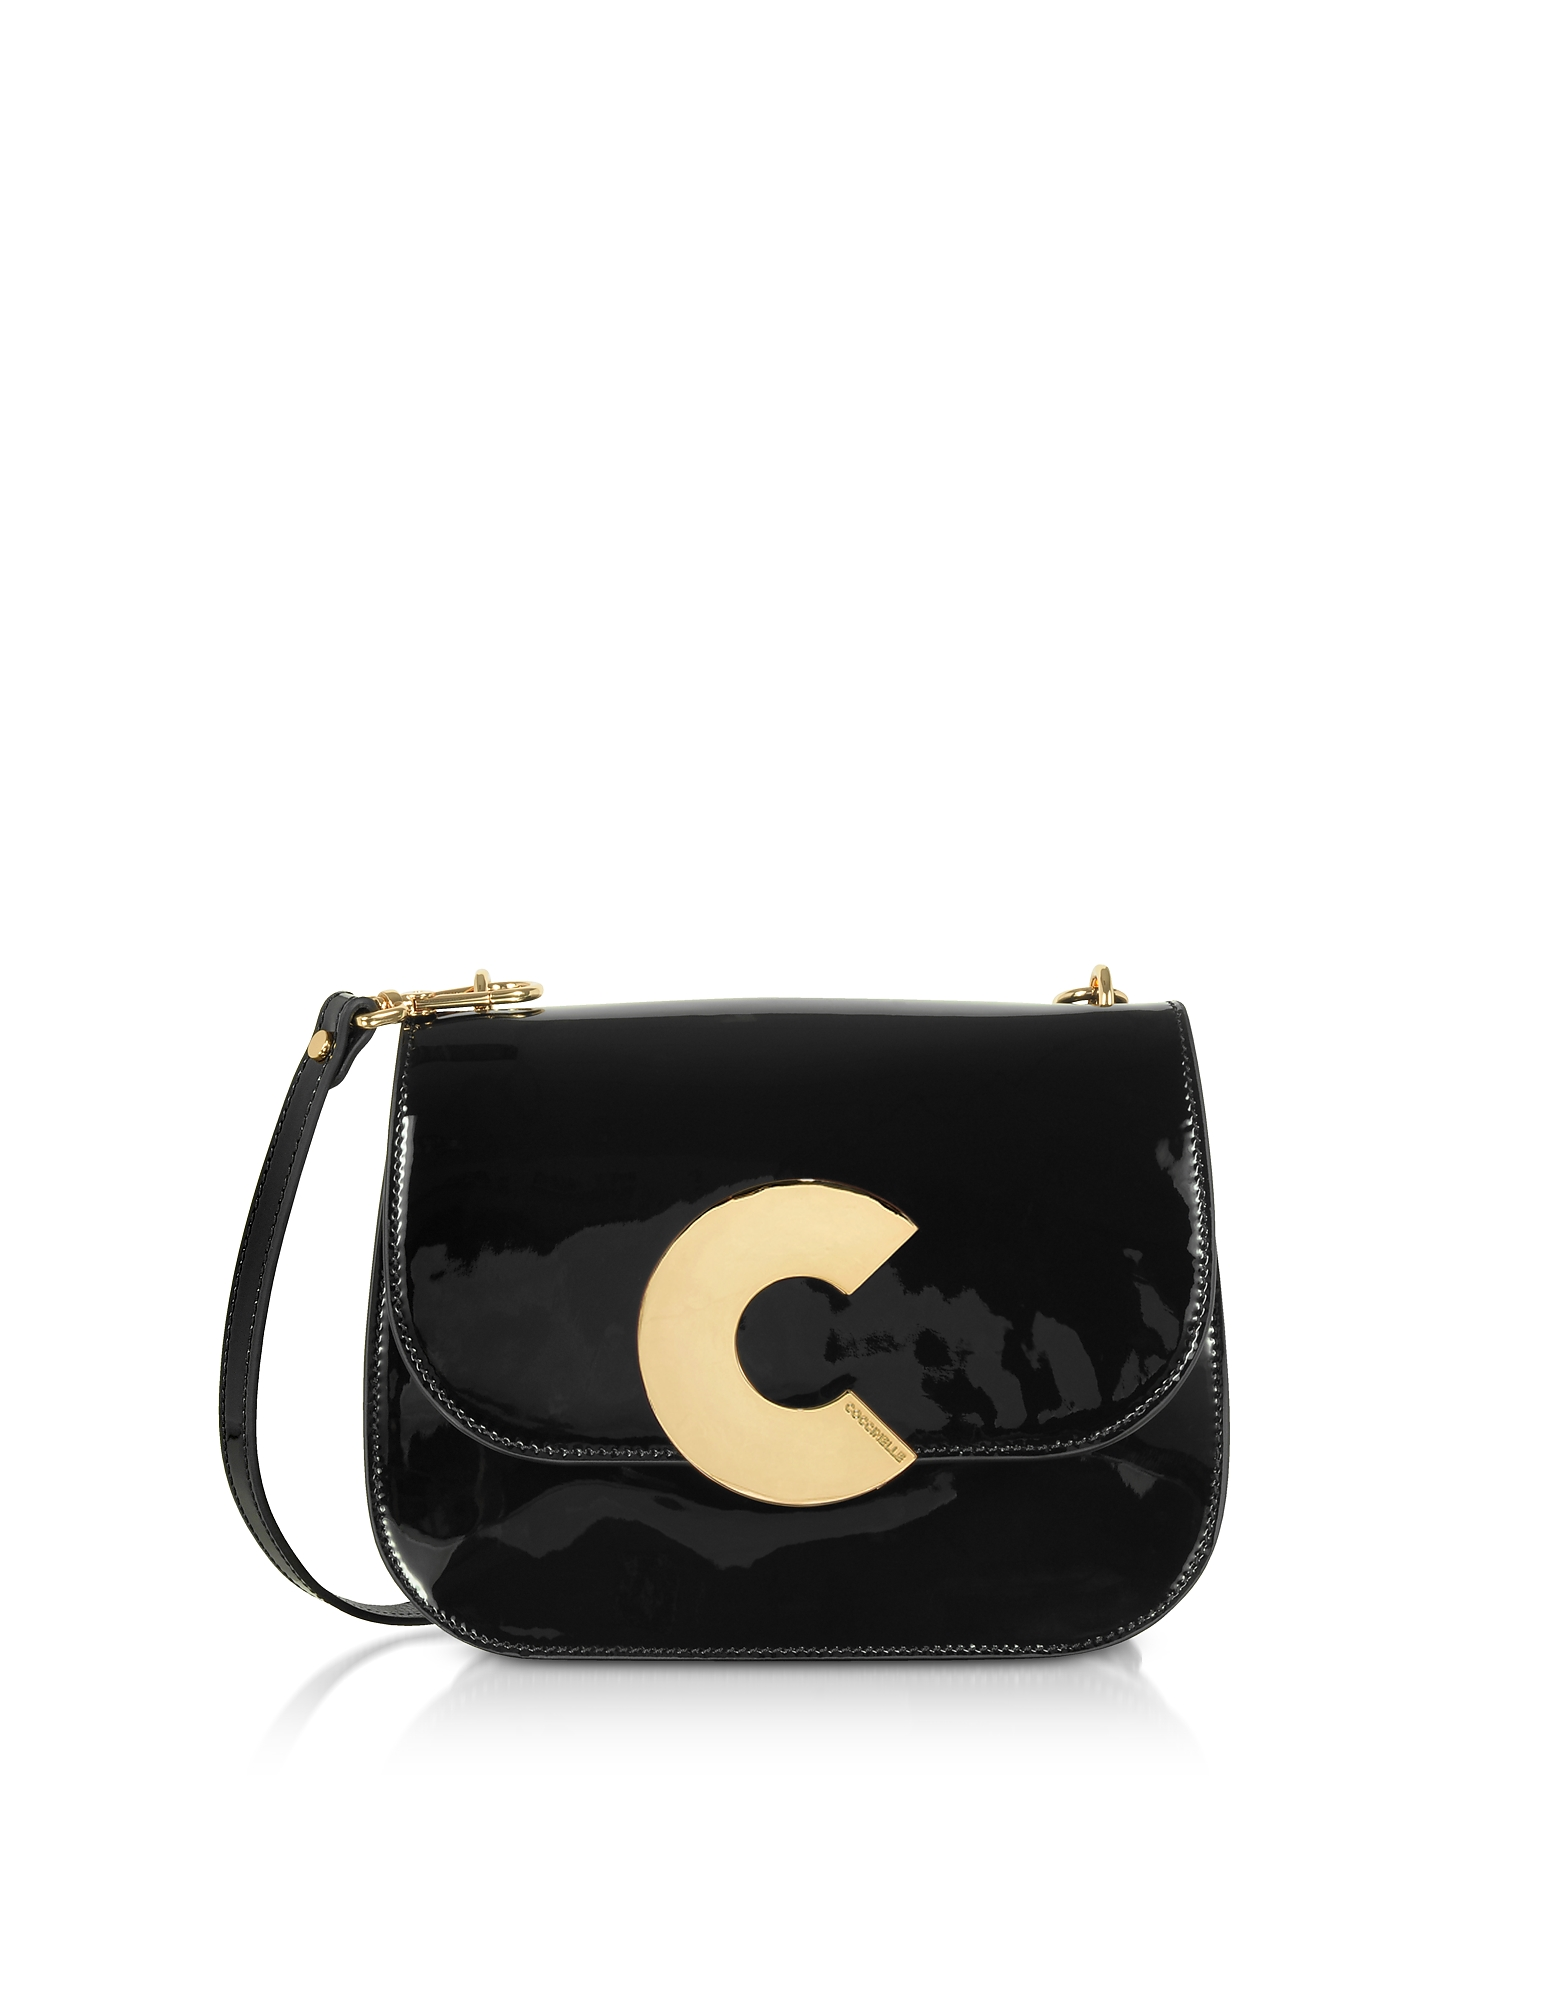 Coccinelle Handbags, Craquante Rock Medium Patent Leather Shoulder Bag